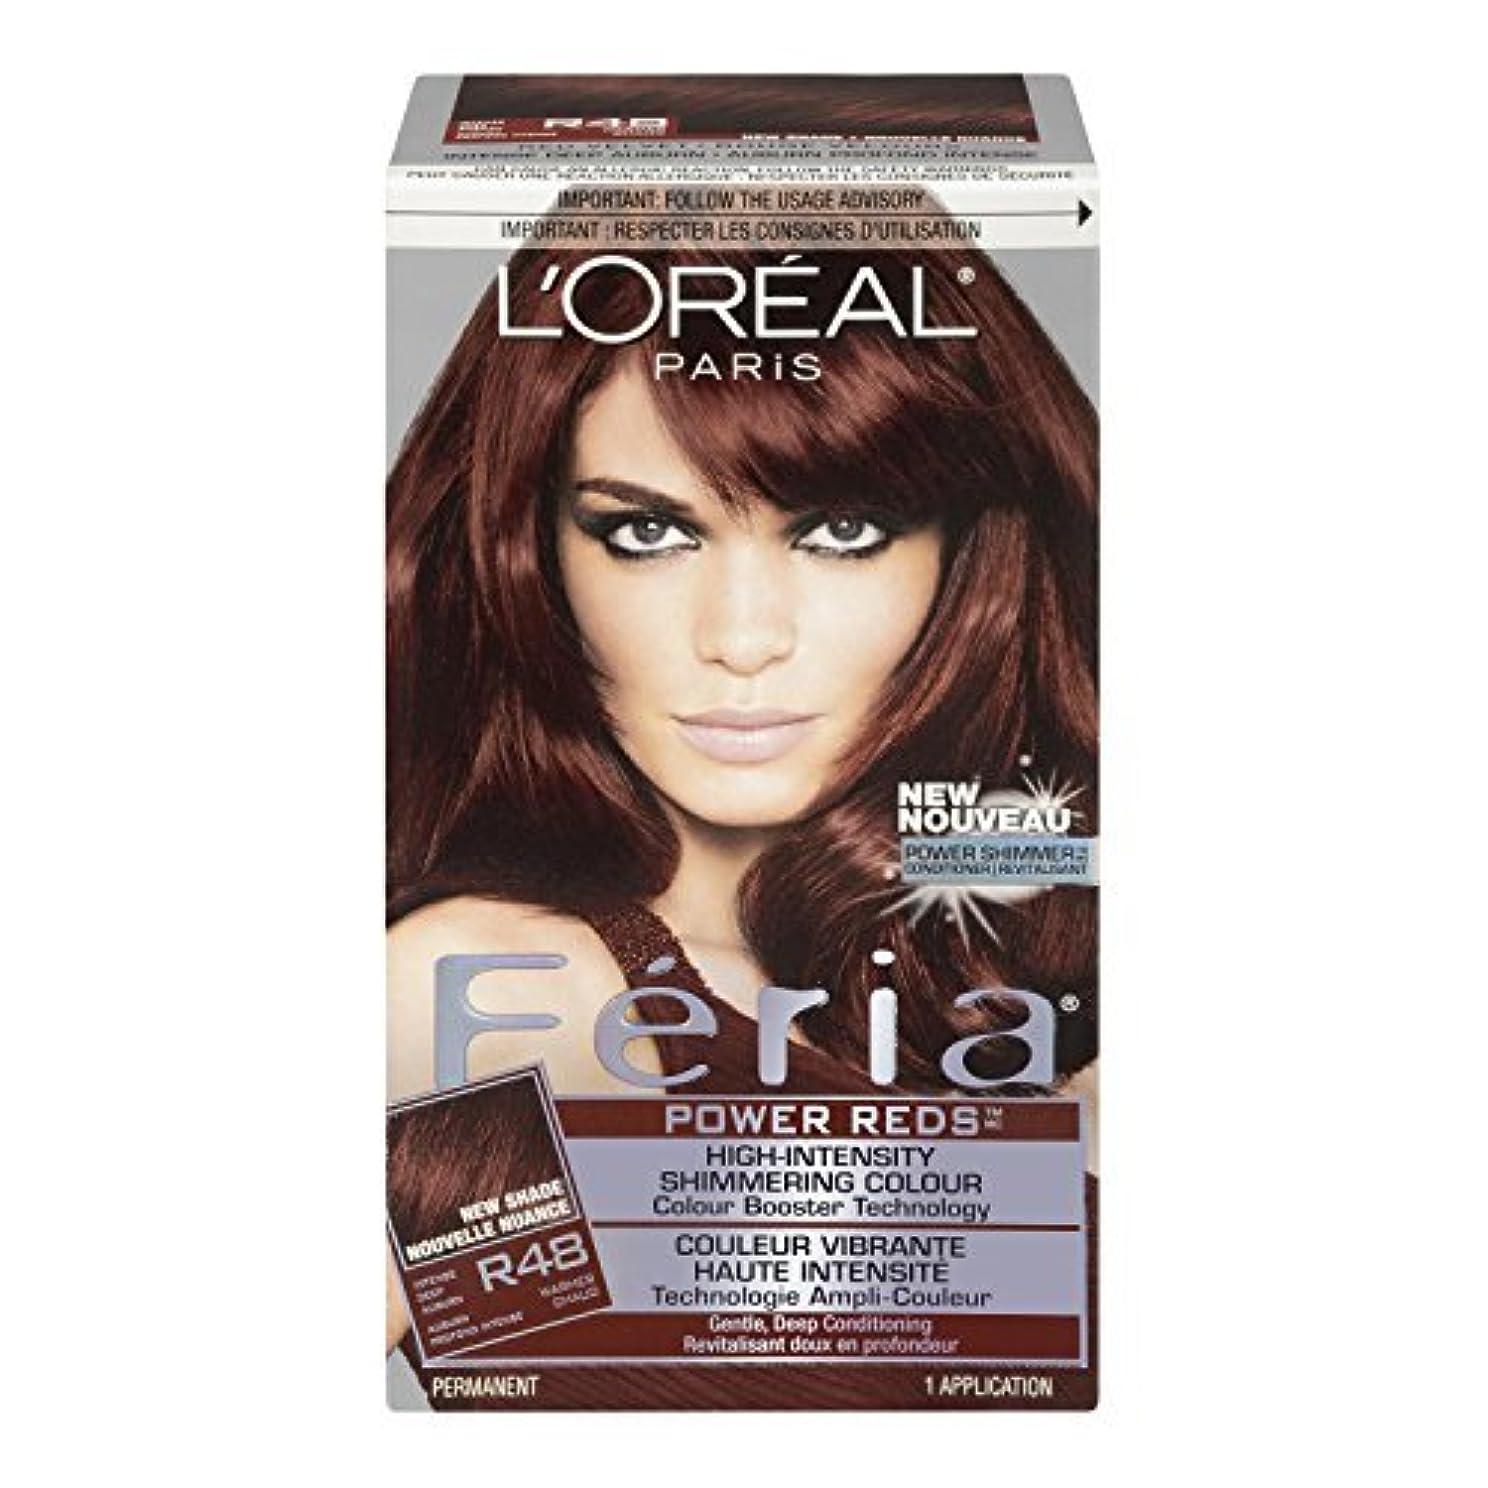 収入虐殺常習的L'Oreal Feria Power Reds Hair Color, R48 Intense Deep Auburn/Red Velvet by L'Oreal Paris Hair Color [並行輸入品]